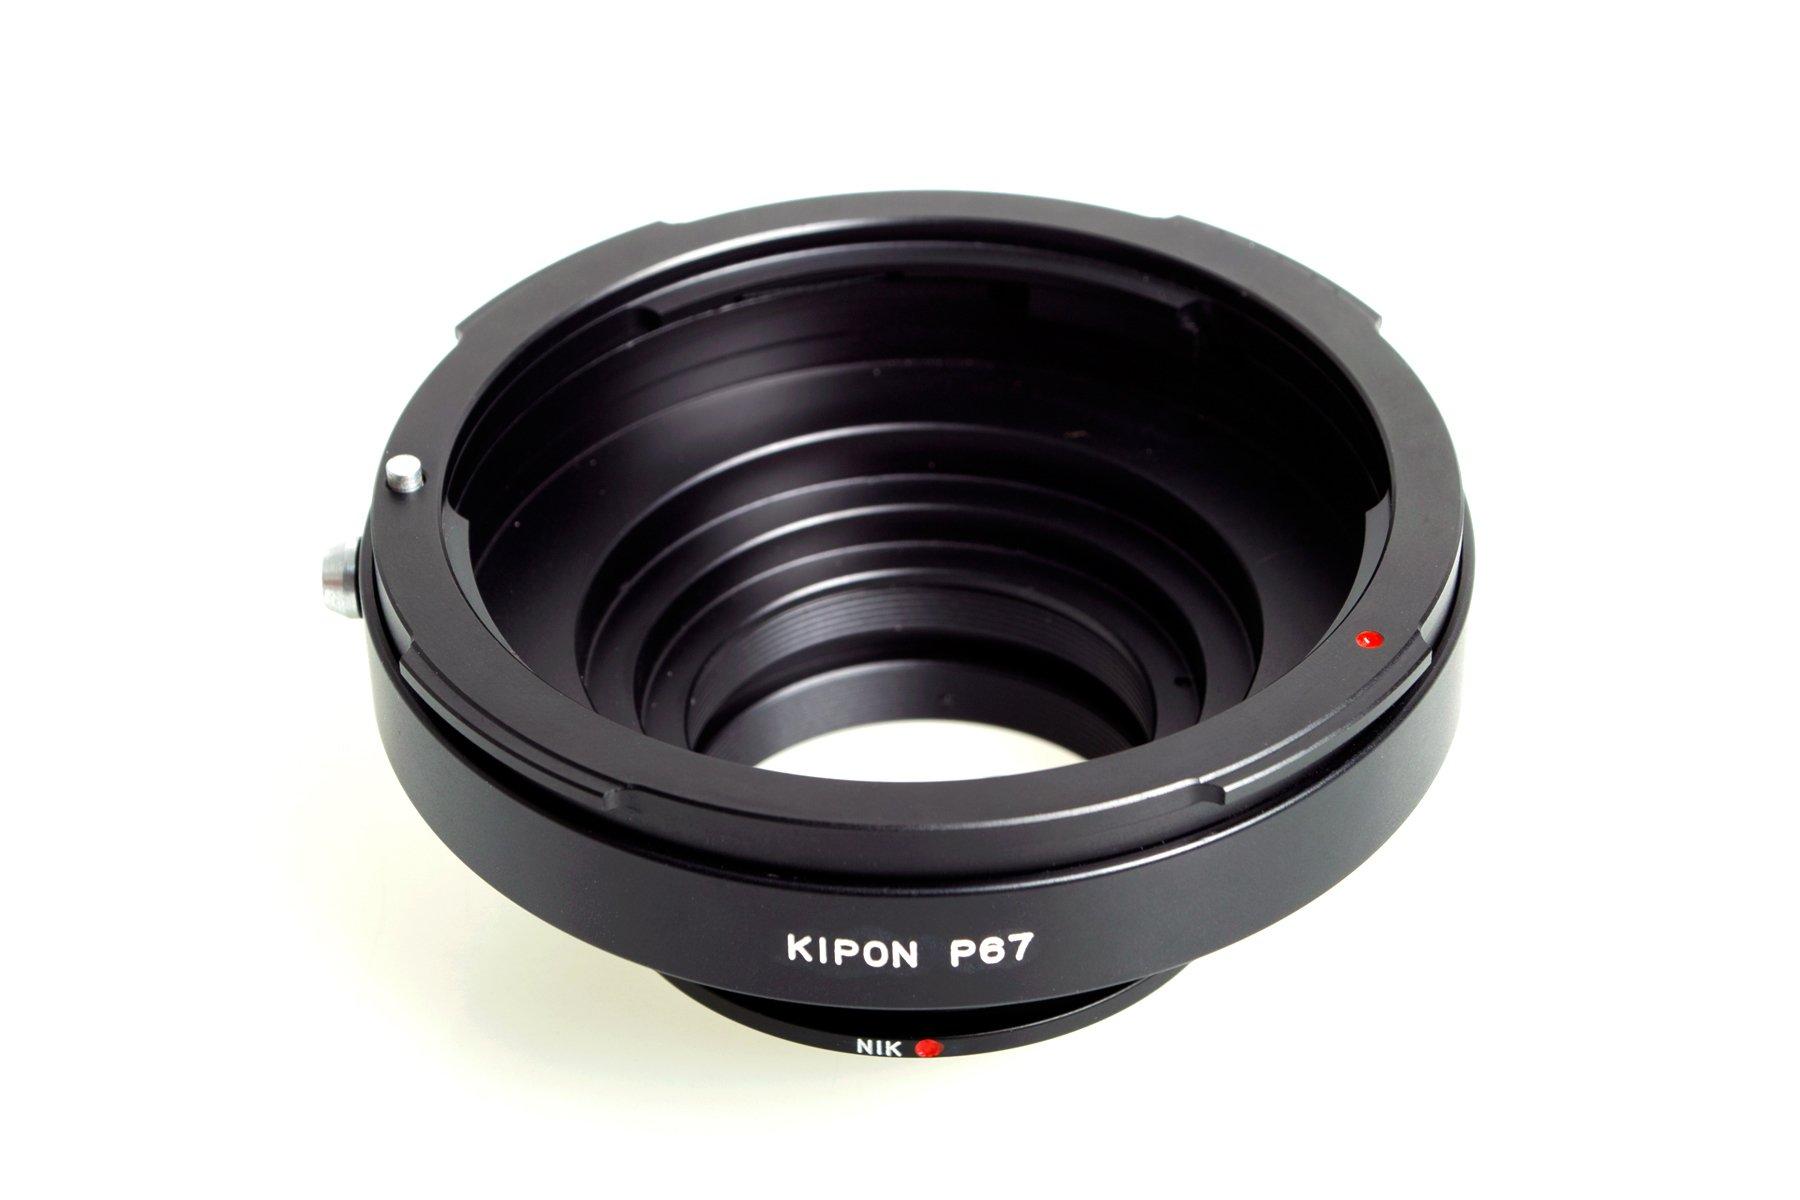 KIPON adaptér objektivu Pentax 67 na tělo Nikon